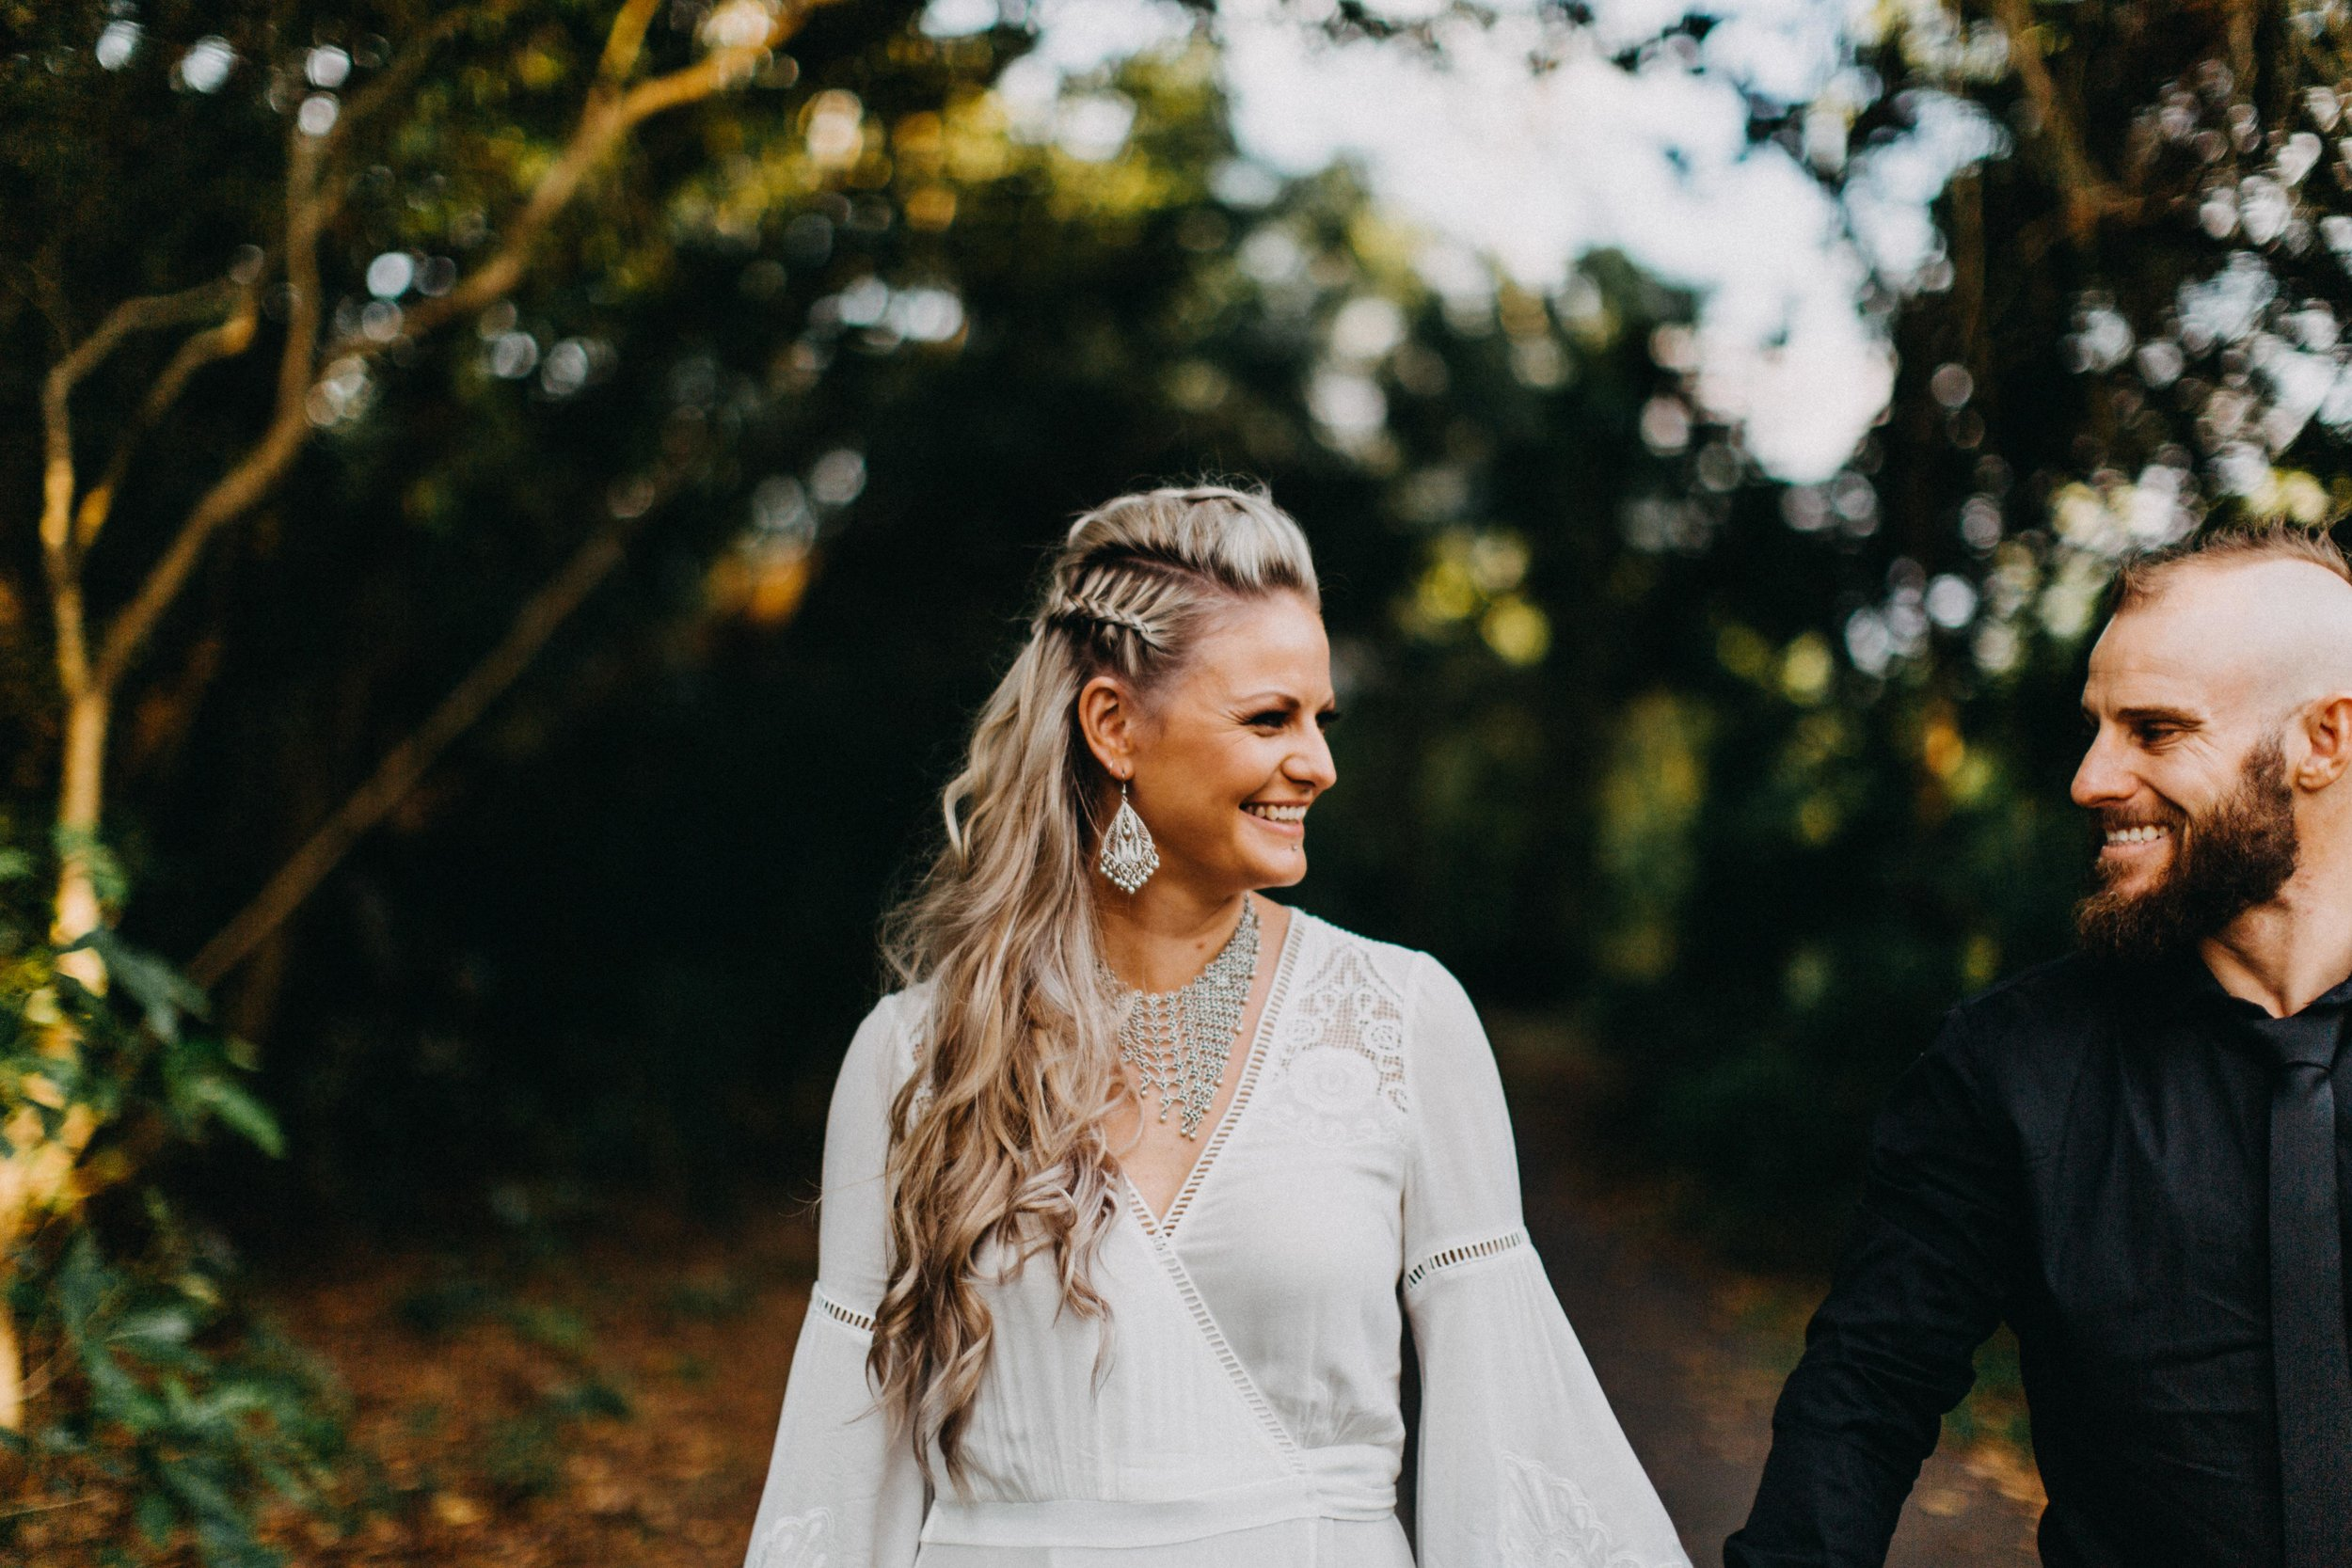 darwin-elopement-wedding-beach-camden-photography-www.emilyobrienphotography.net-60.jpg